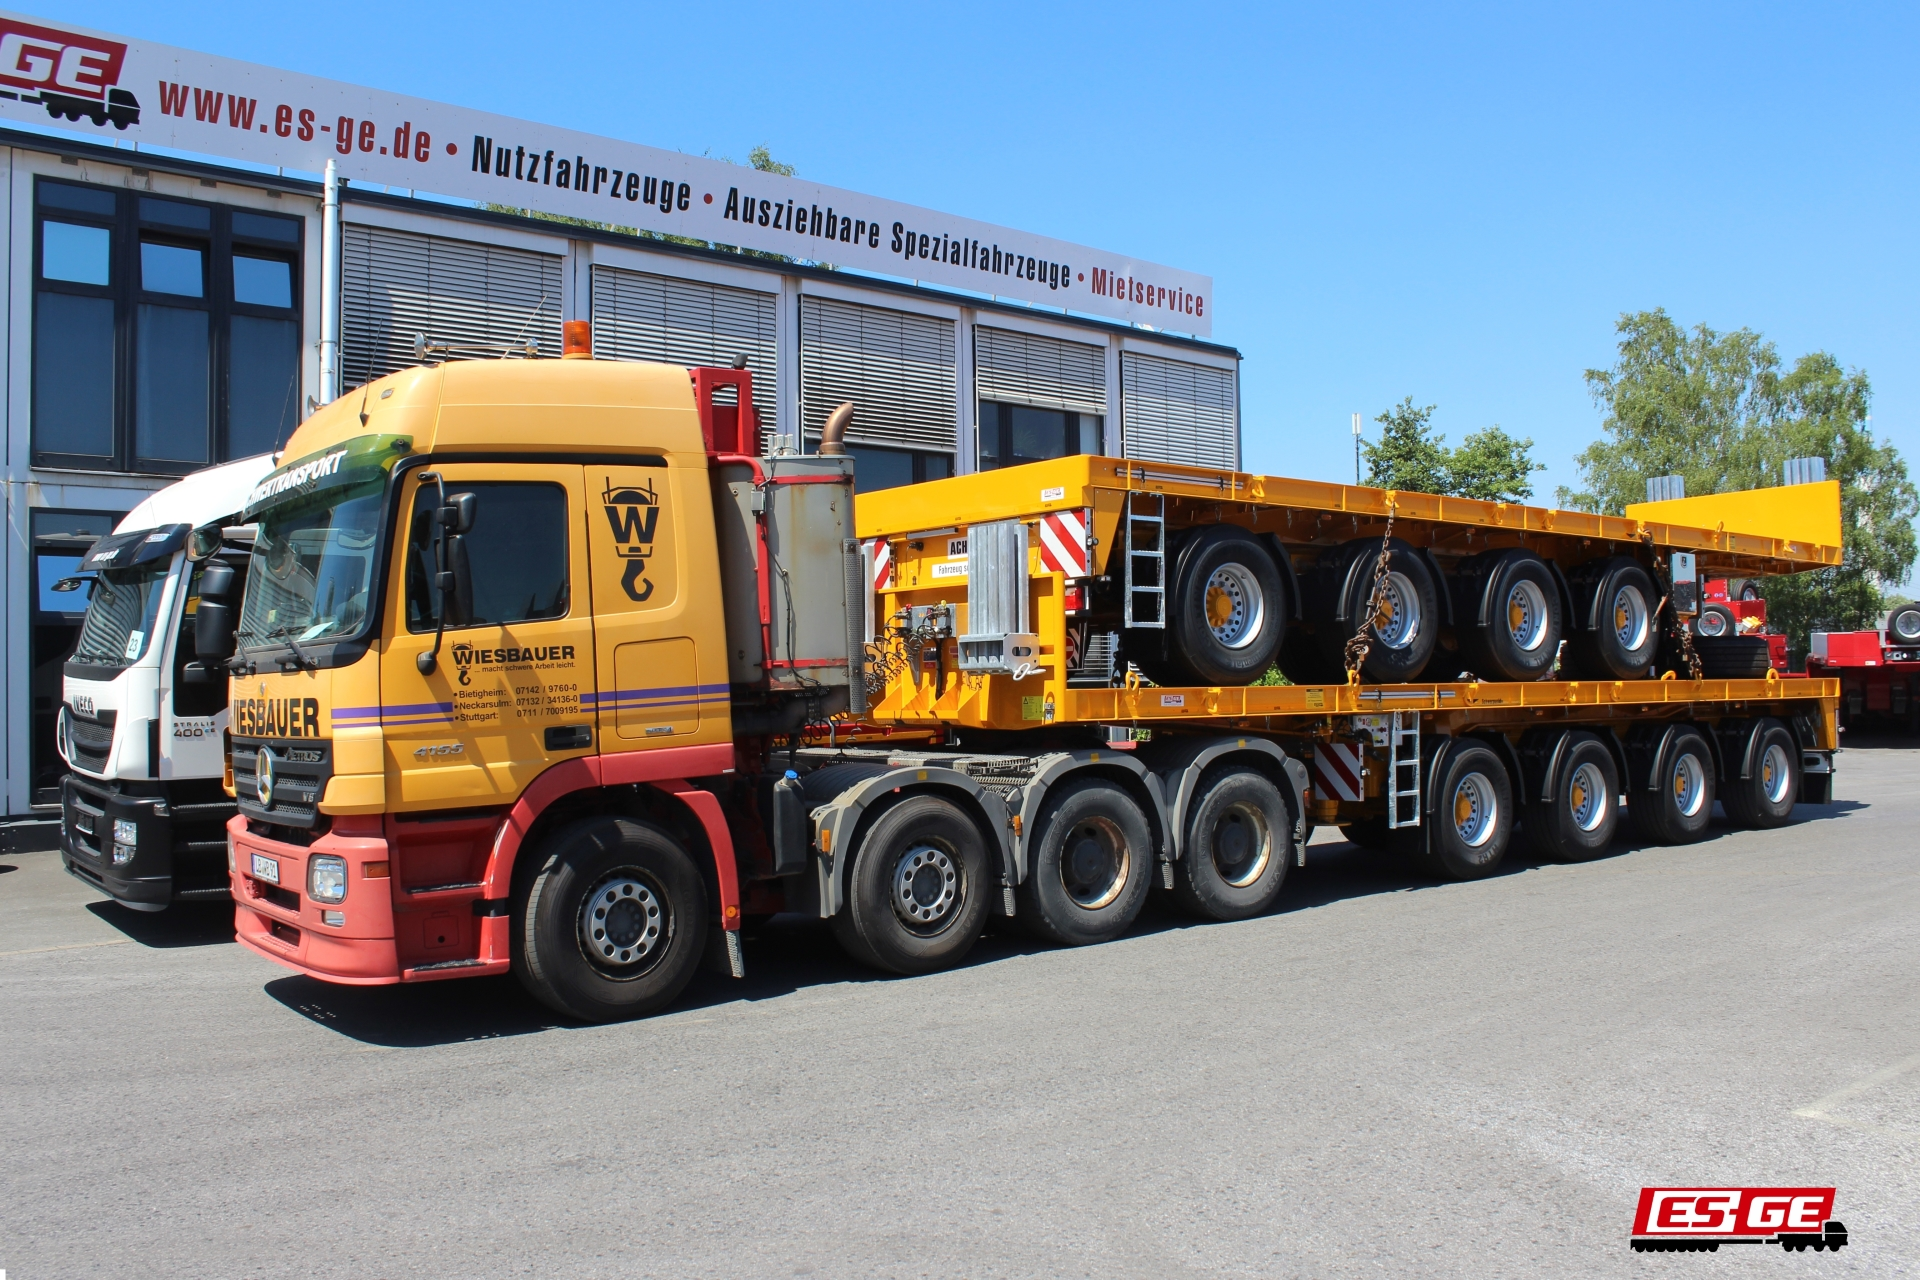 Wiesbauer-ES-GE-ballast-semitrailers